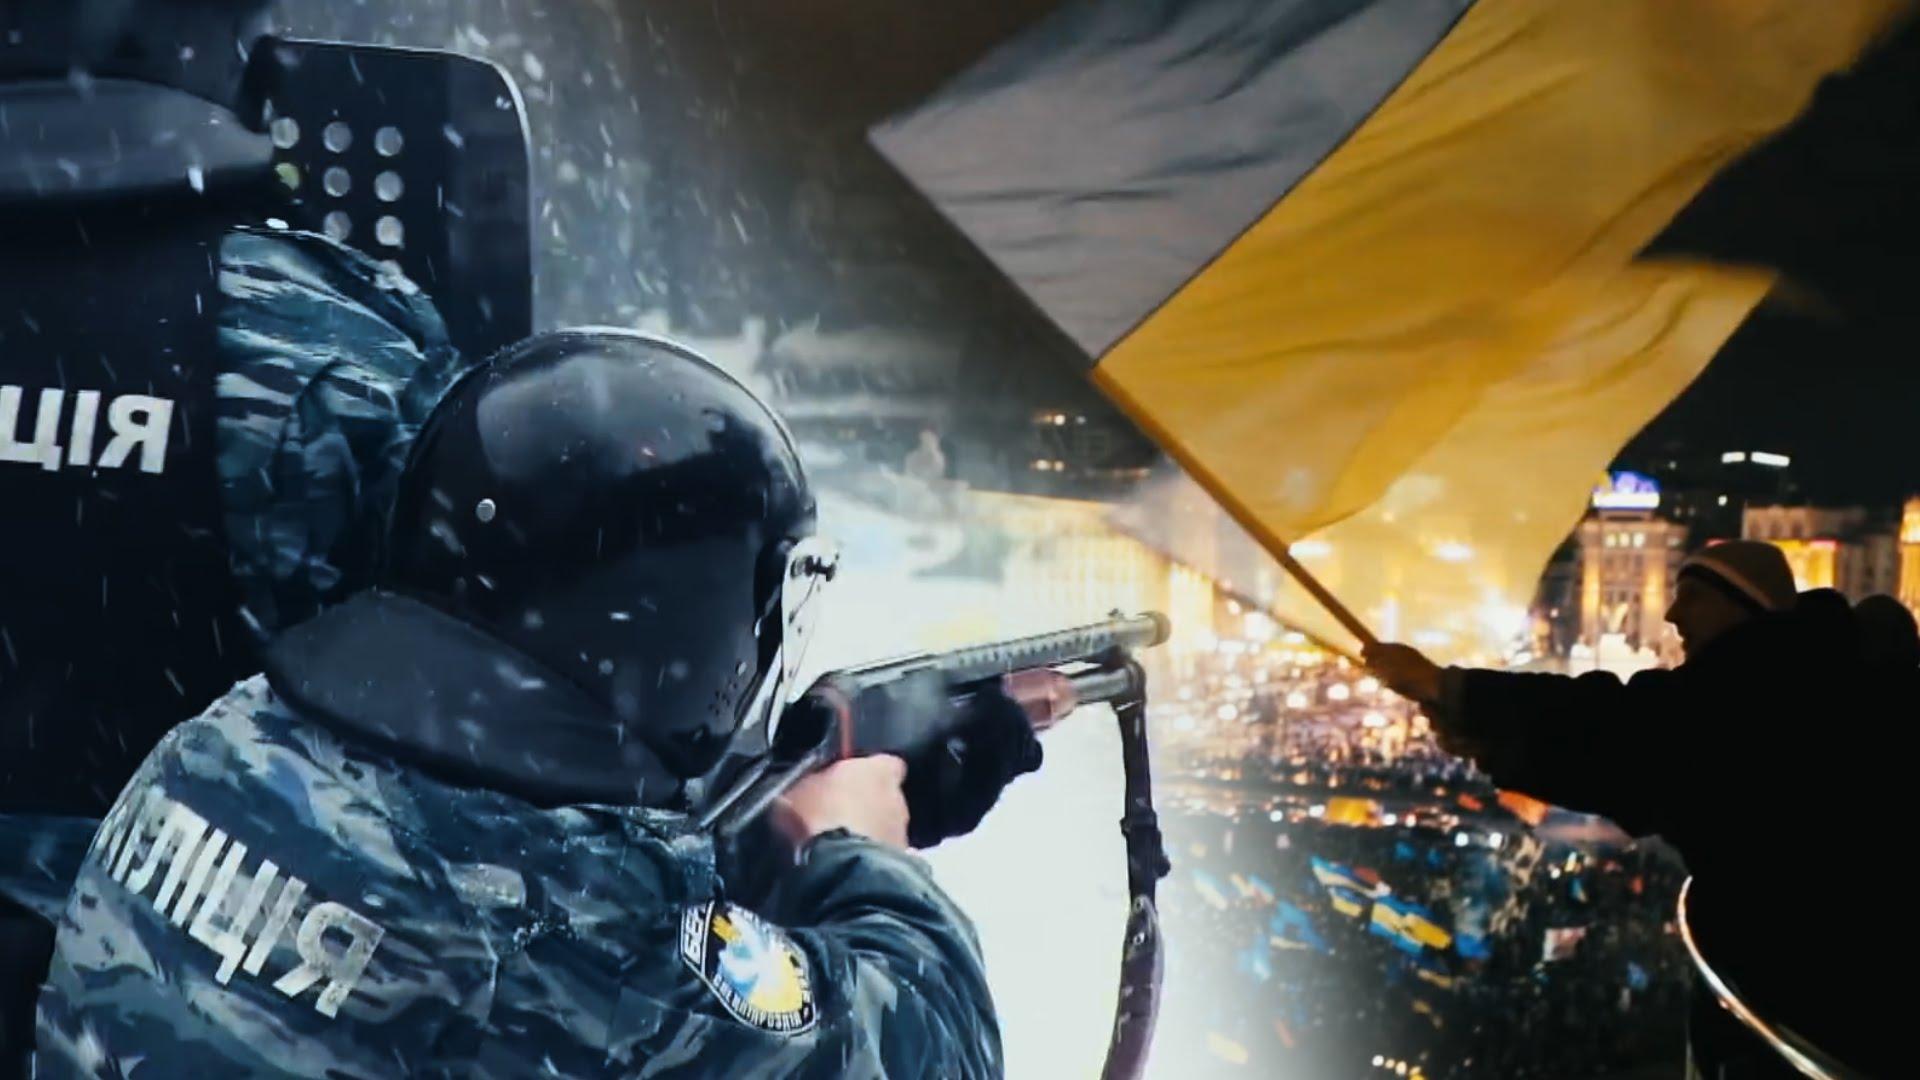 winter on fire ukraine s fight for freedom cinema365. Black Bedroom Furniture Sets. Home Design Ideas